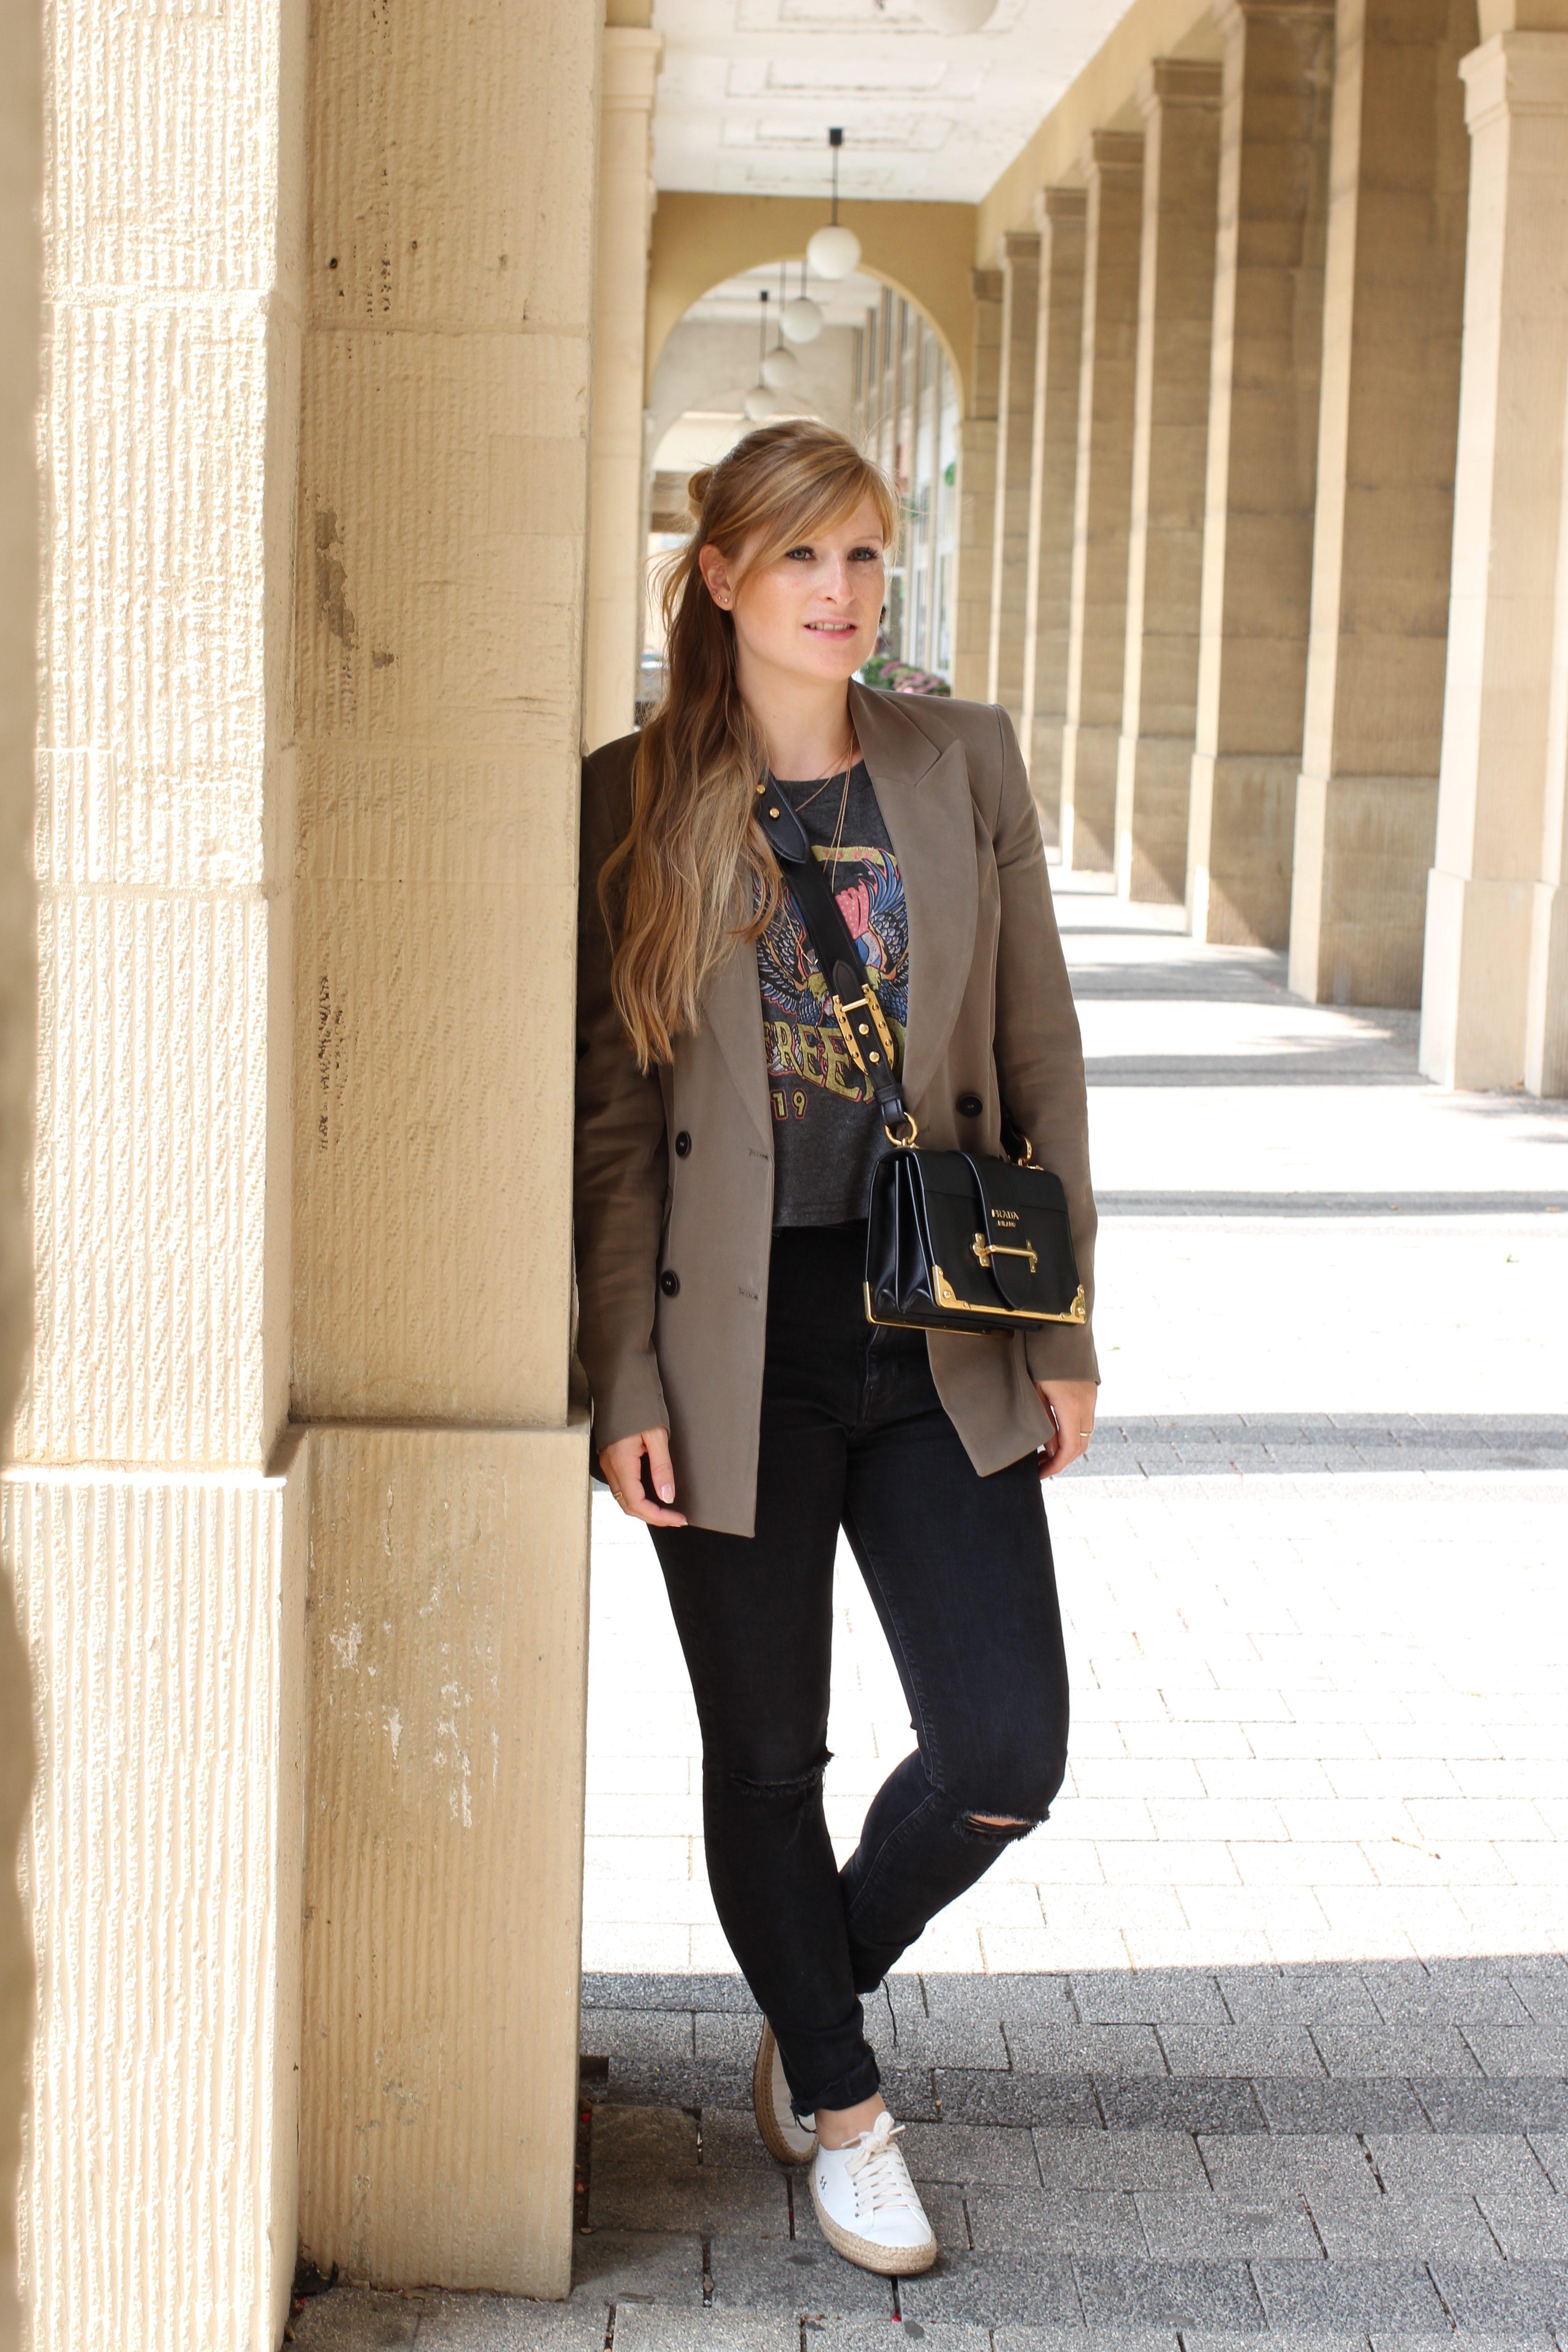 Highwaist Jeans Crop Top Print kombinieren Lieblings-Blazer Zara Blazer Navy Grün Prada Cahier Bag Frühlingslook Outfit Modeblog Karlsruhe 1